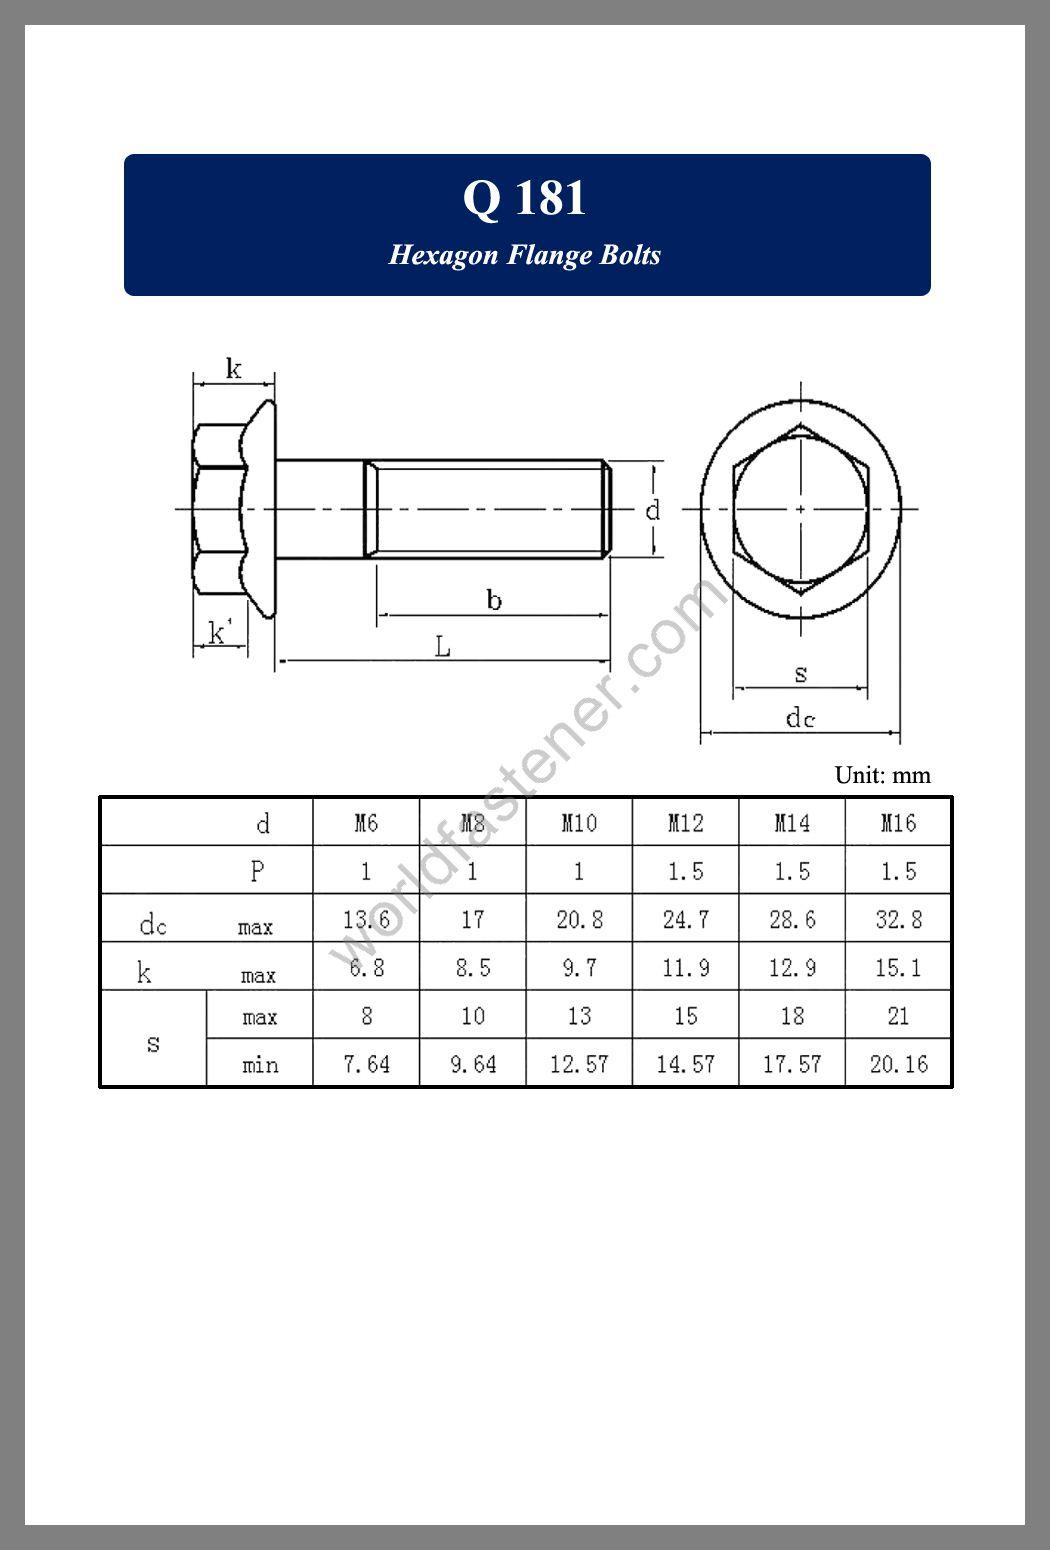 Q 181, Q 181 Flanged Bolts, Flange screws, fastener, screw, bolt, Q bolts